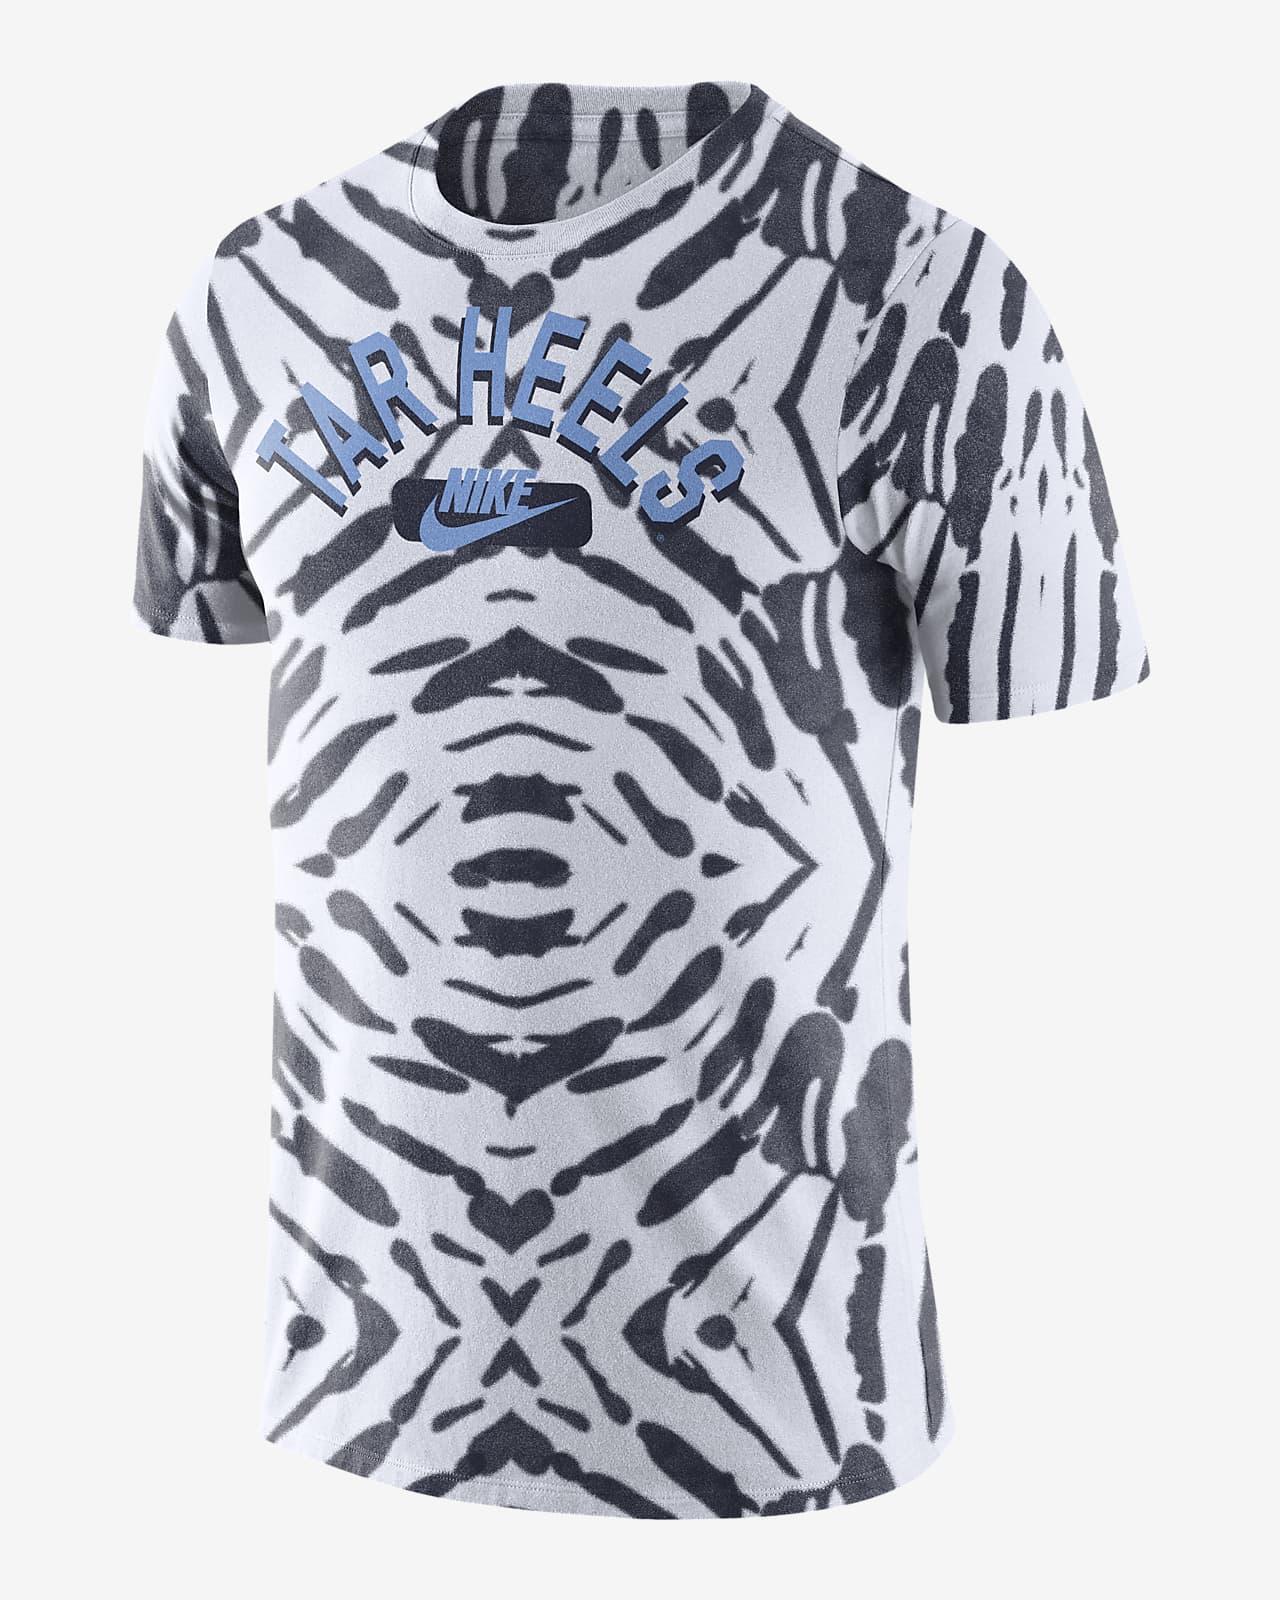 Nike College (UNC) Men's Printed T-Shirt